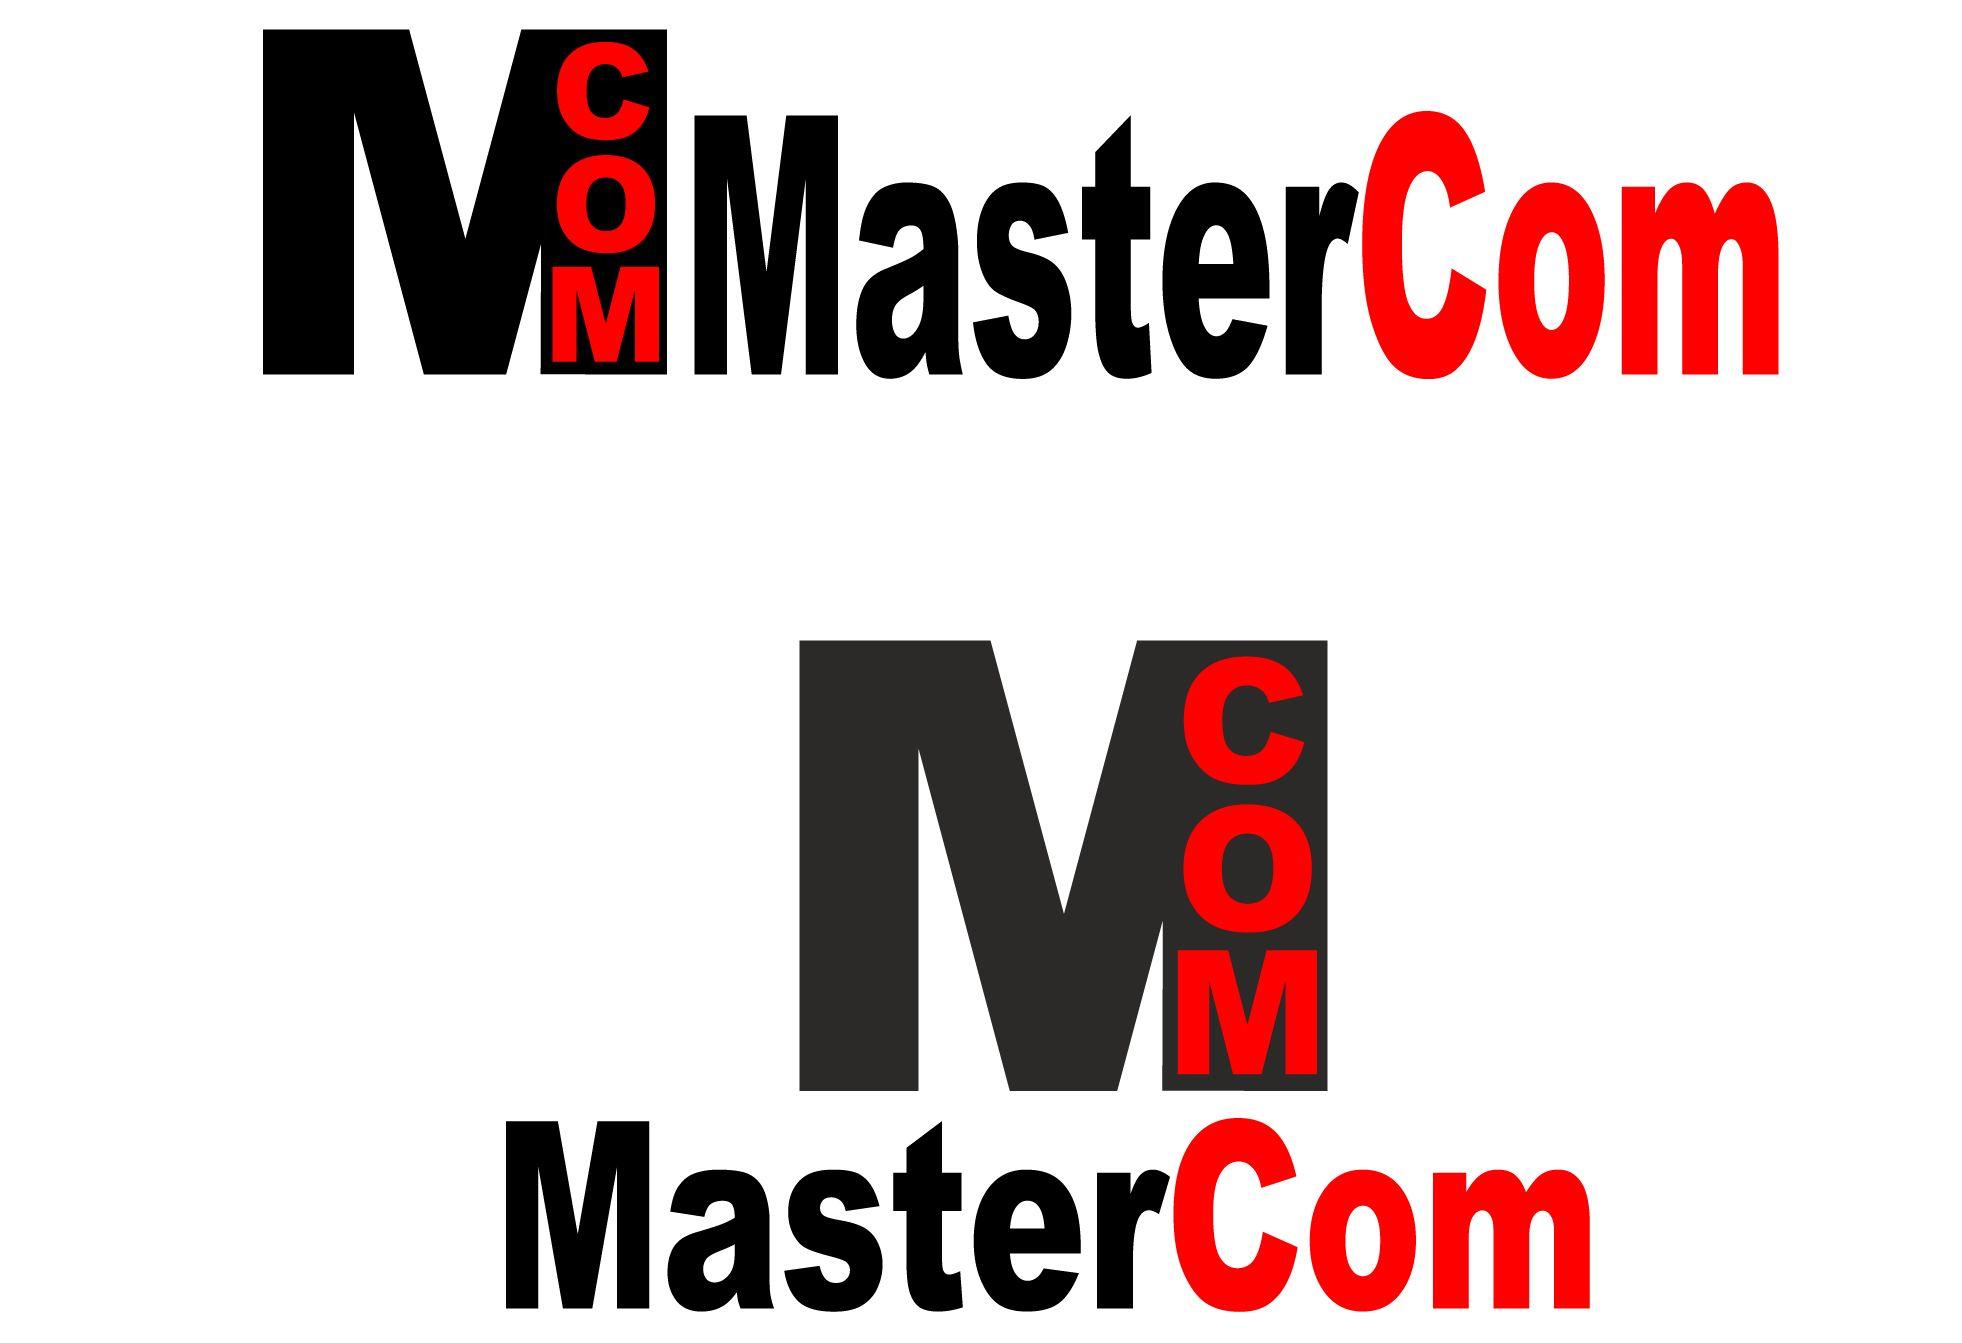 MasterCom (логотип, фирменный стиль) - дизайнер Valentin1982